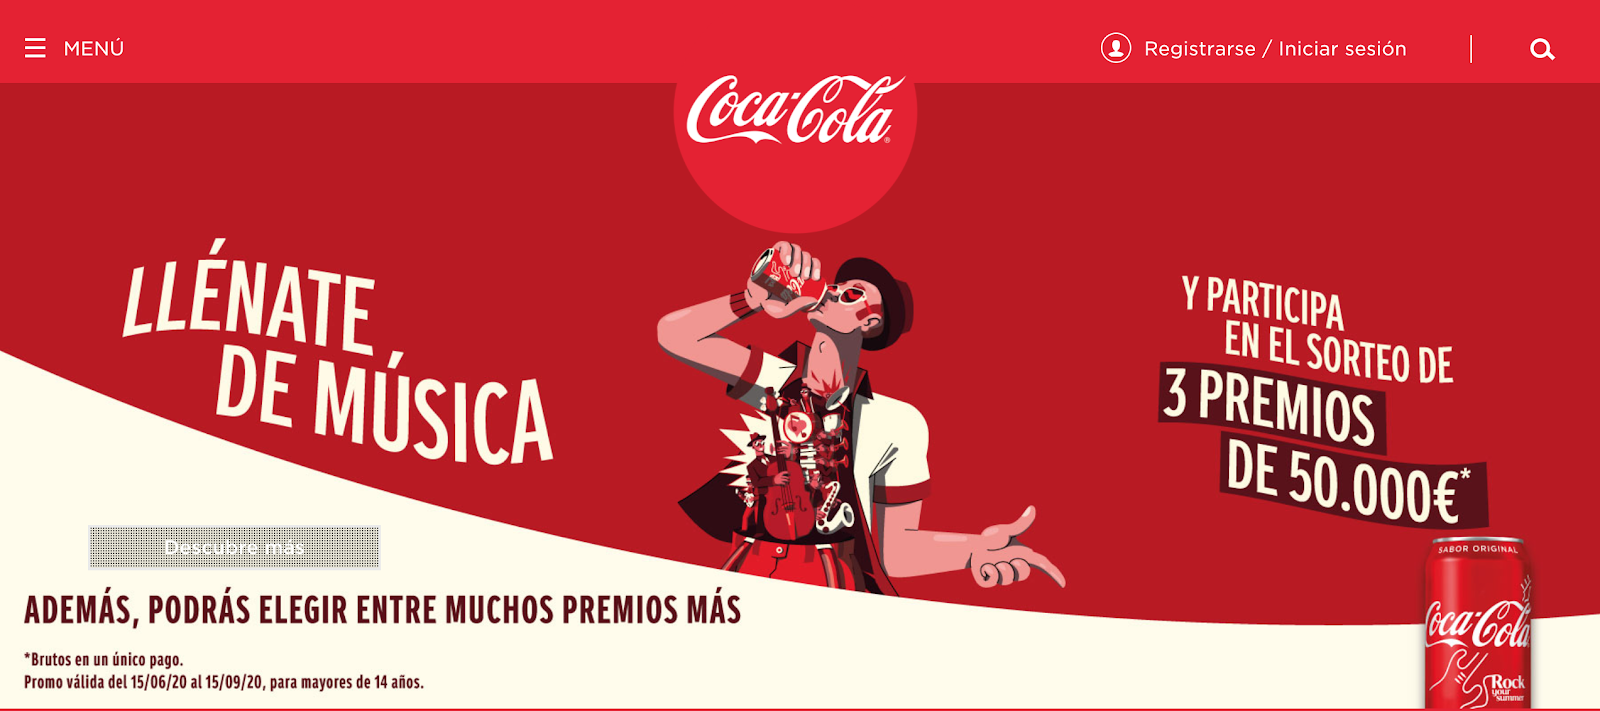 Localization example for Coca Cola